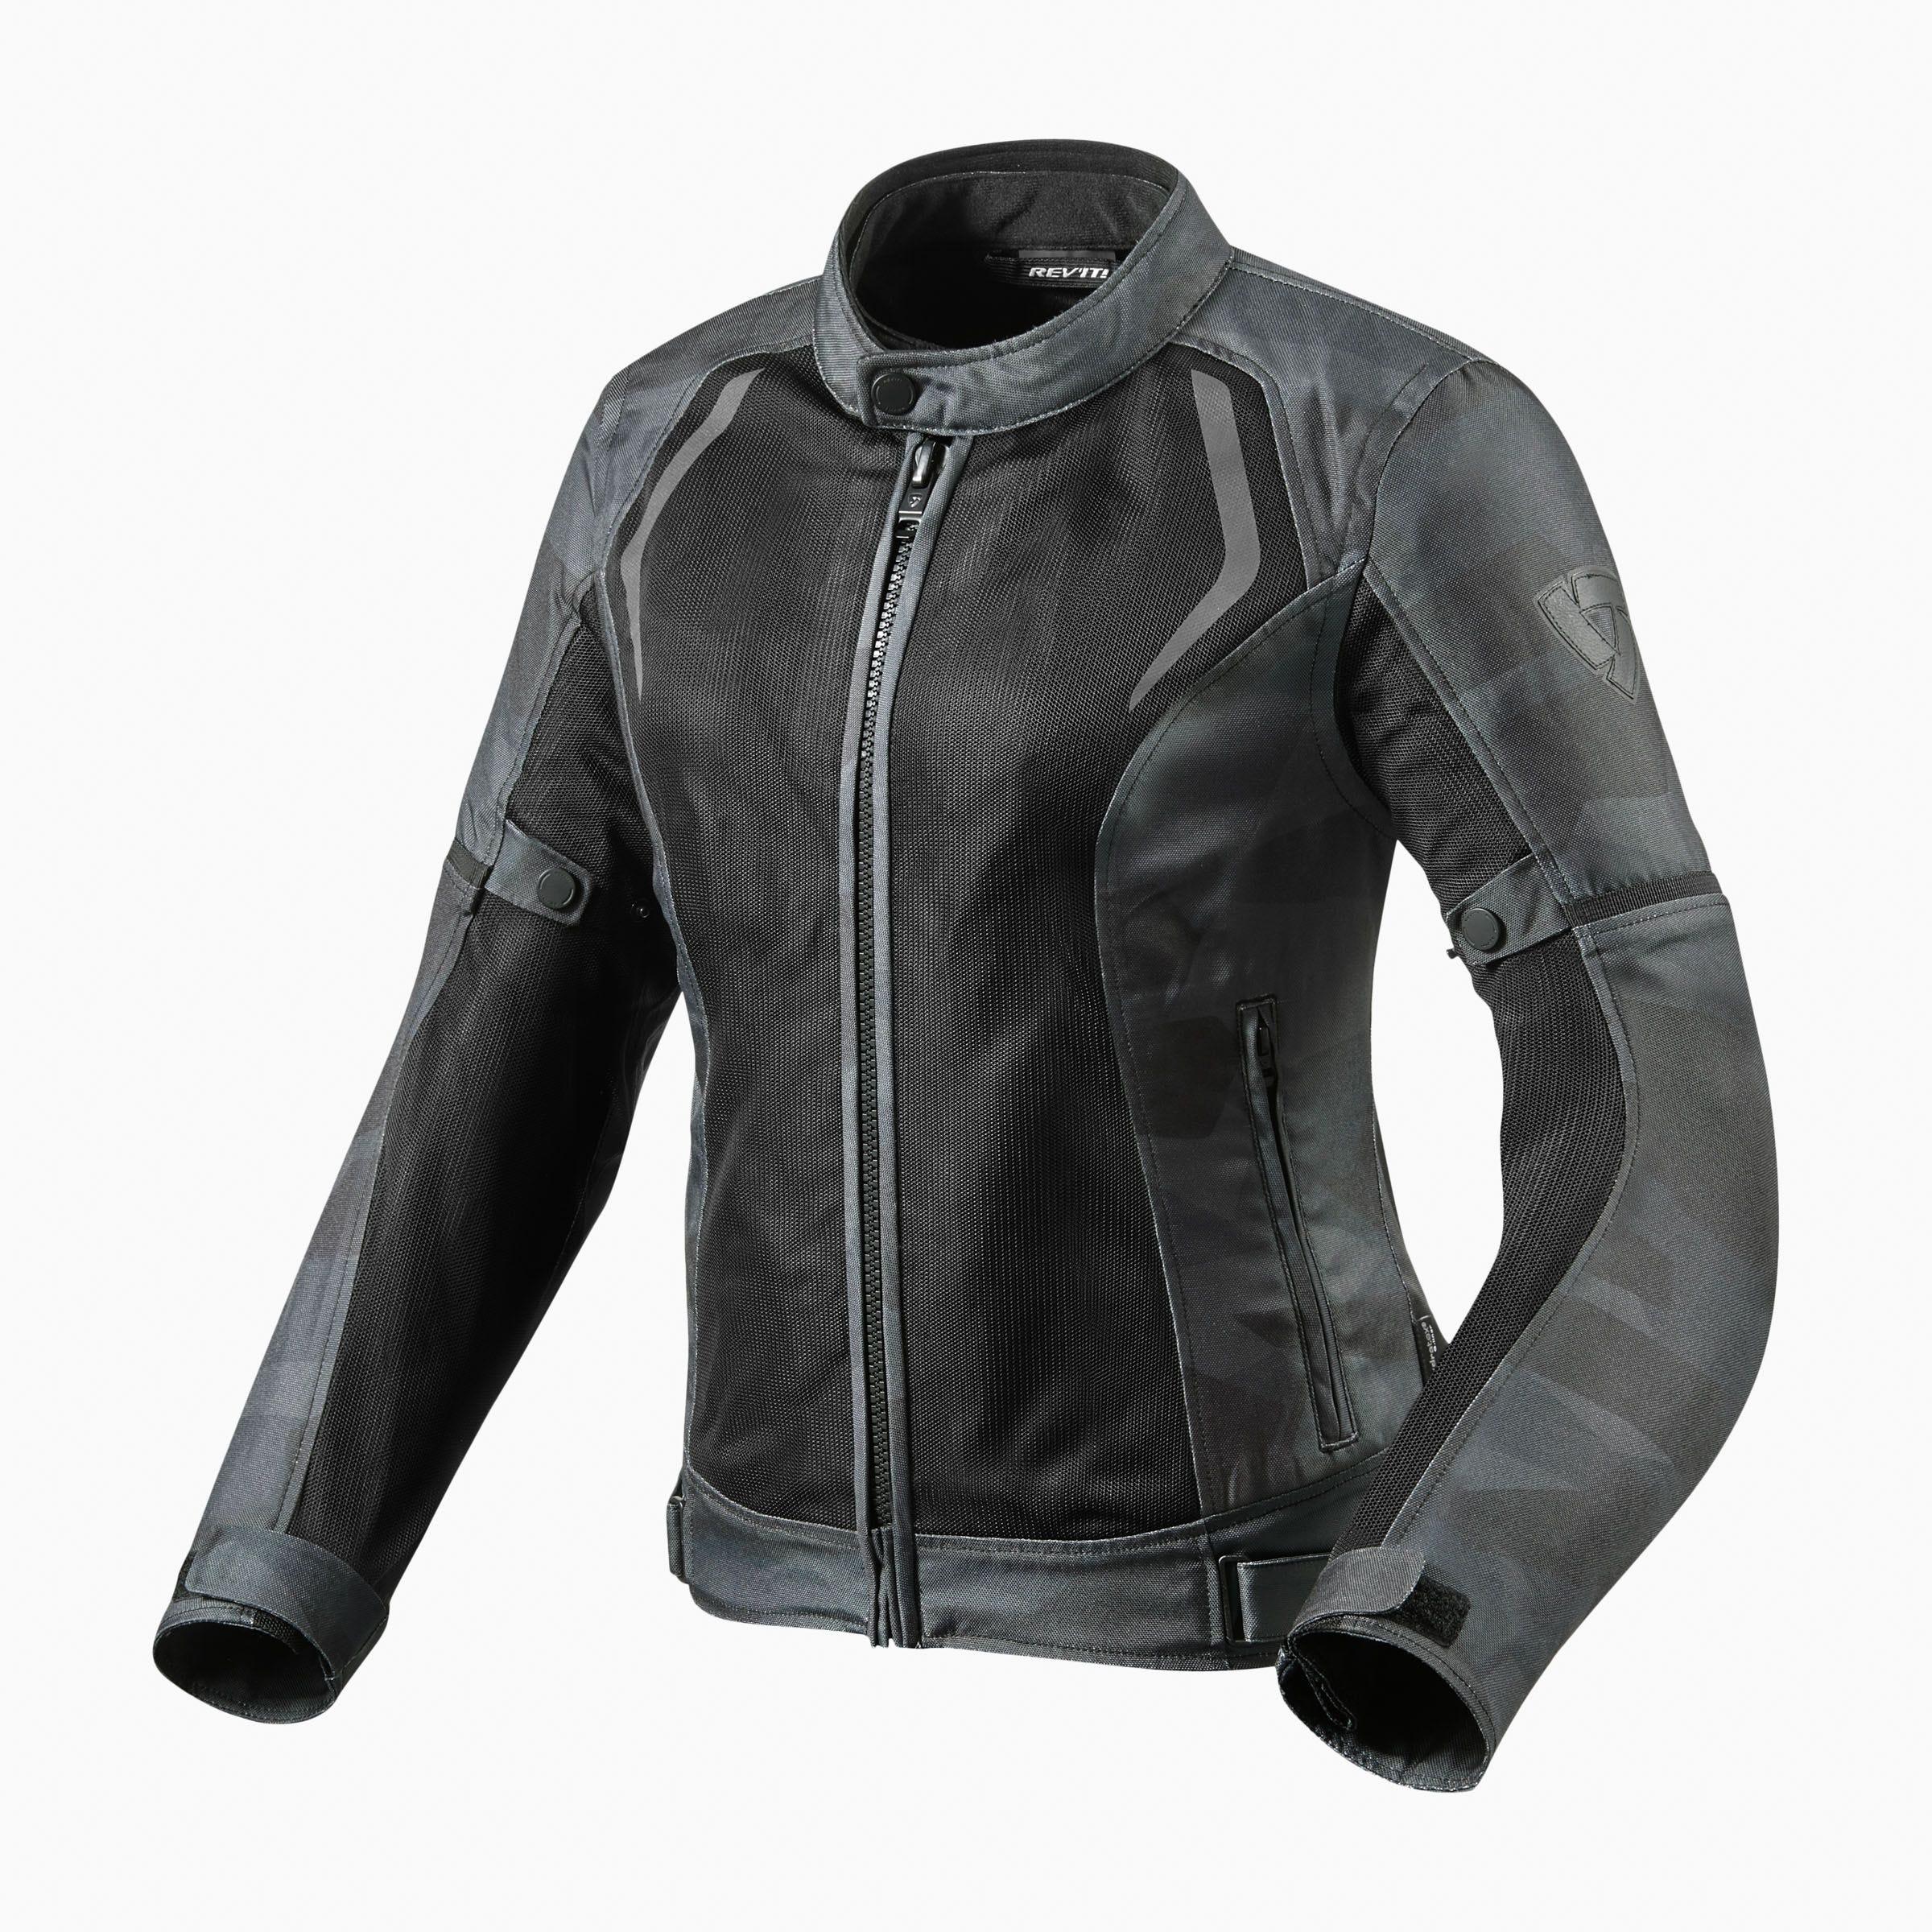 Revit Torque Ladies 3 season Jacket